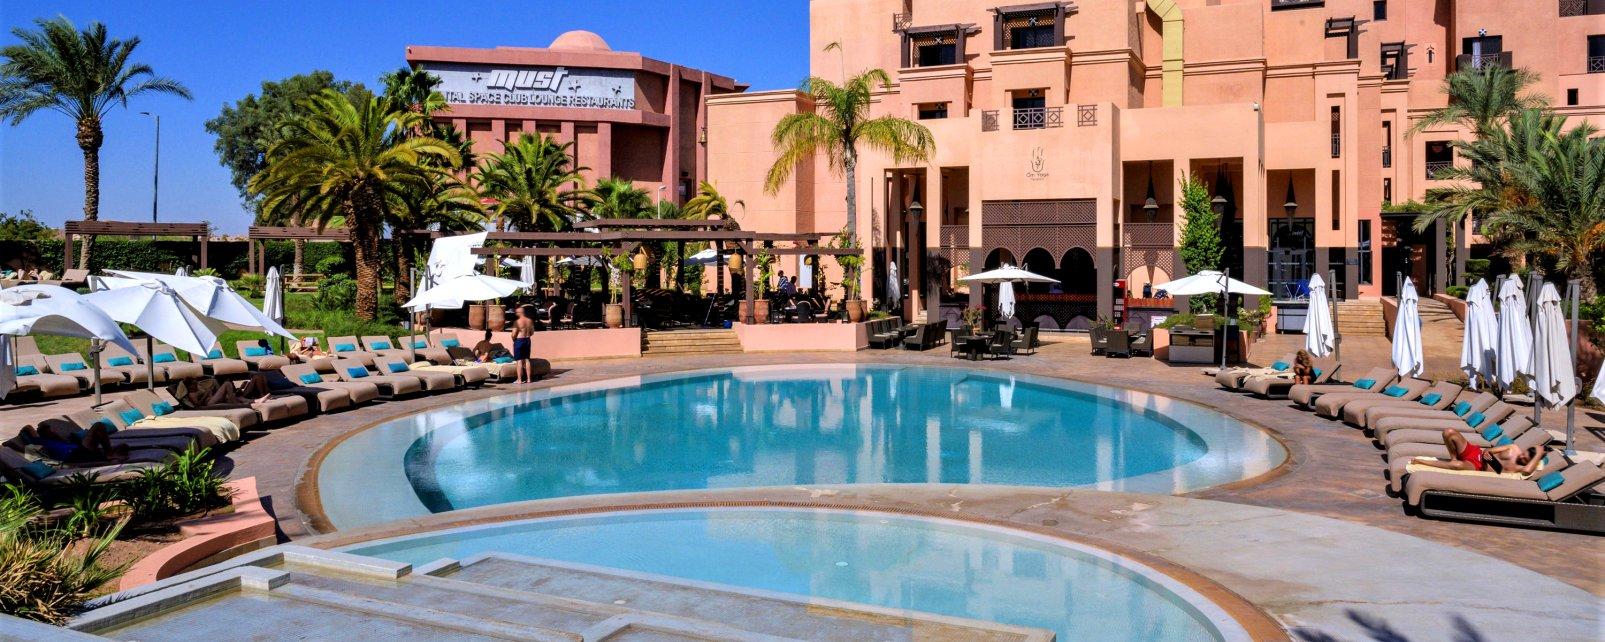 Hôtel Mansour Eddahbi